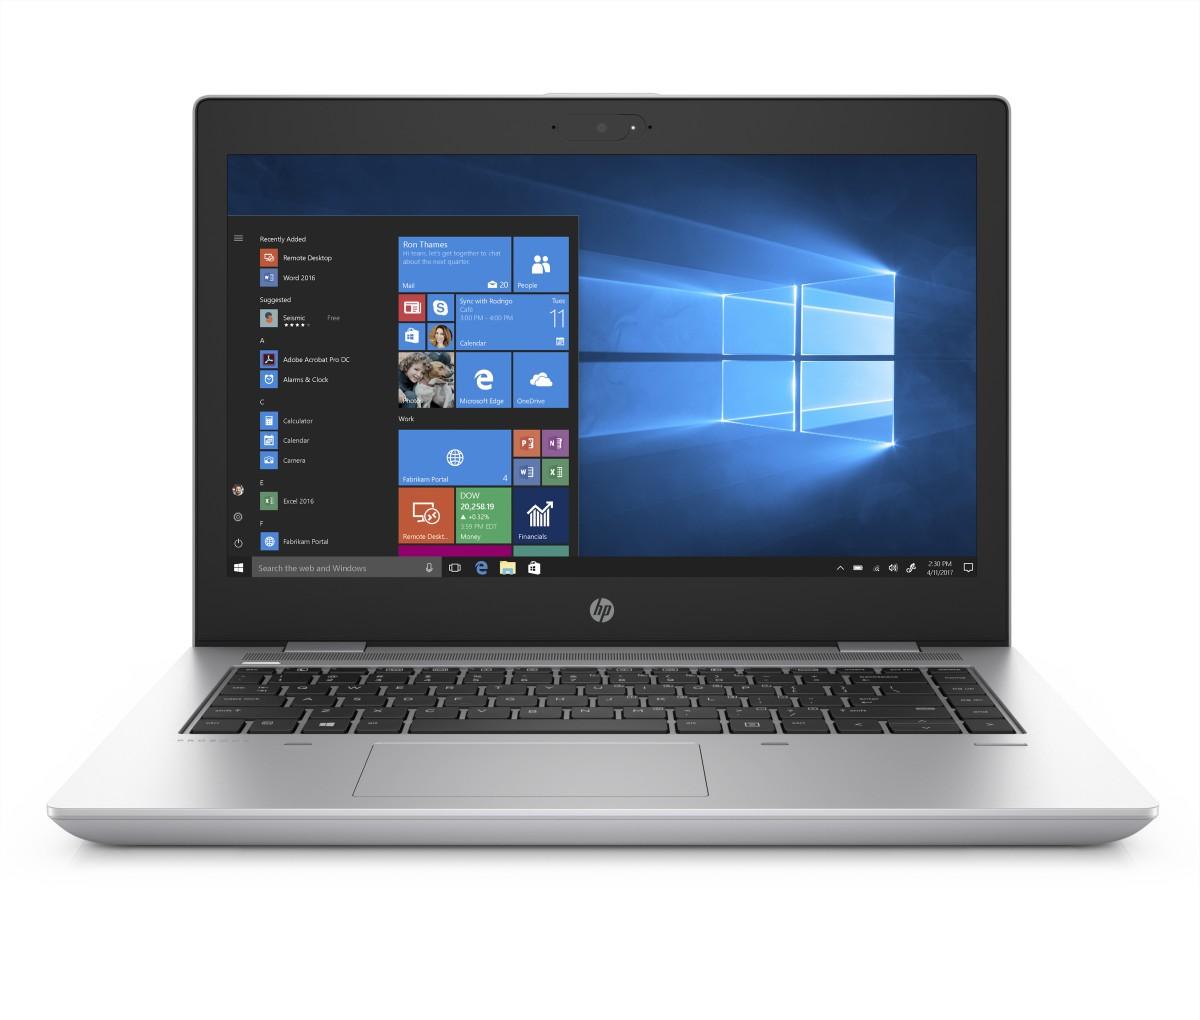 "HP ProBook 640 G4 14"" FHD i5-8250U/8GB/256SSD/VGA/DP/RJ45/WIFI/BT/MCR/FPR/1RServis/W10P"